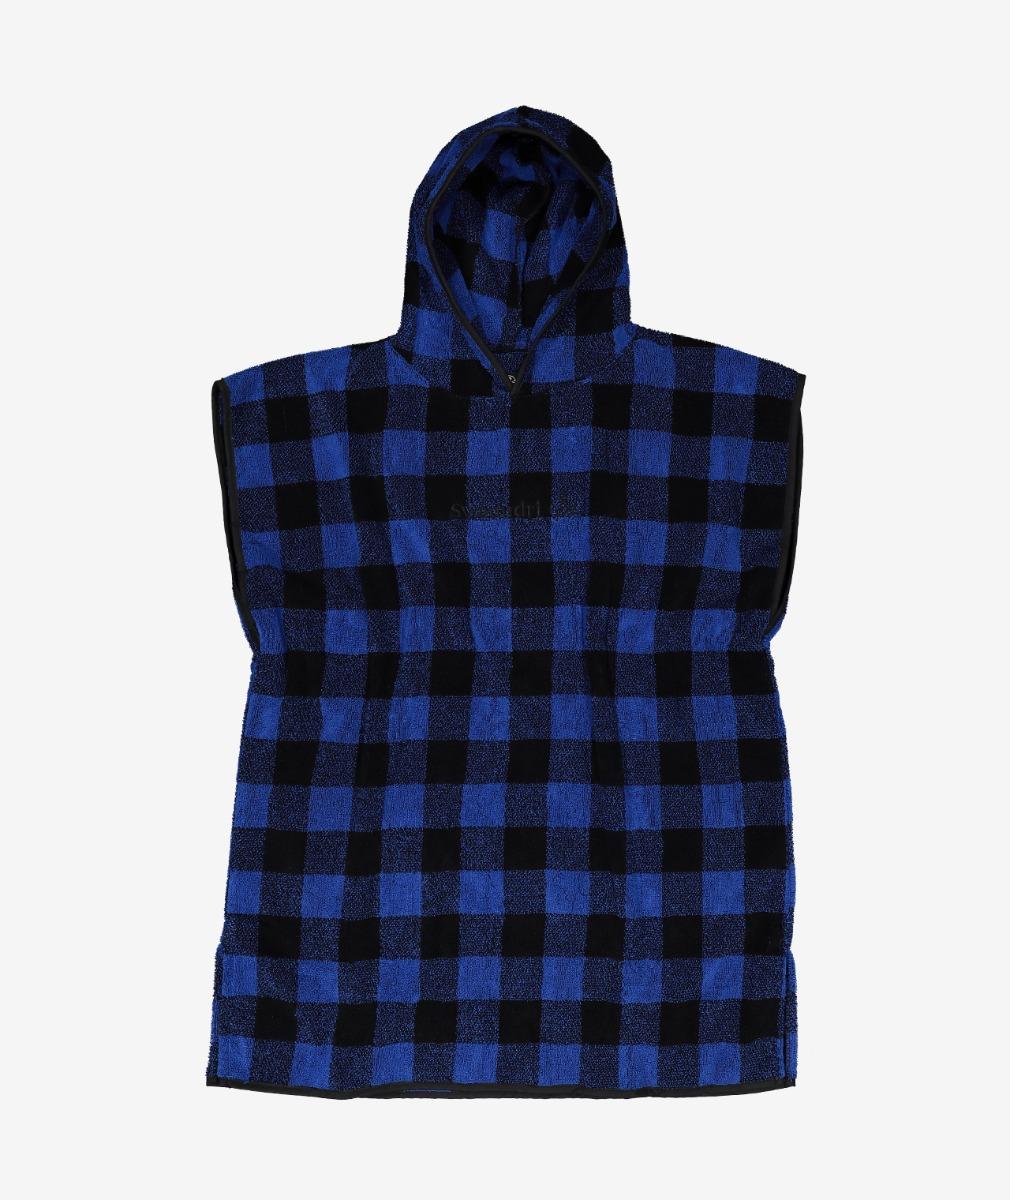 Swanndri Taylors Hooded Towel for Kids in Blue/Black